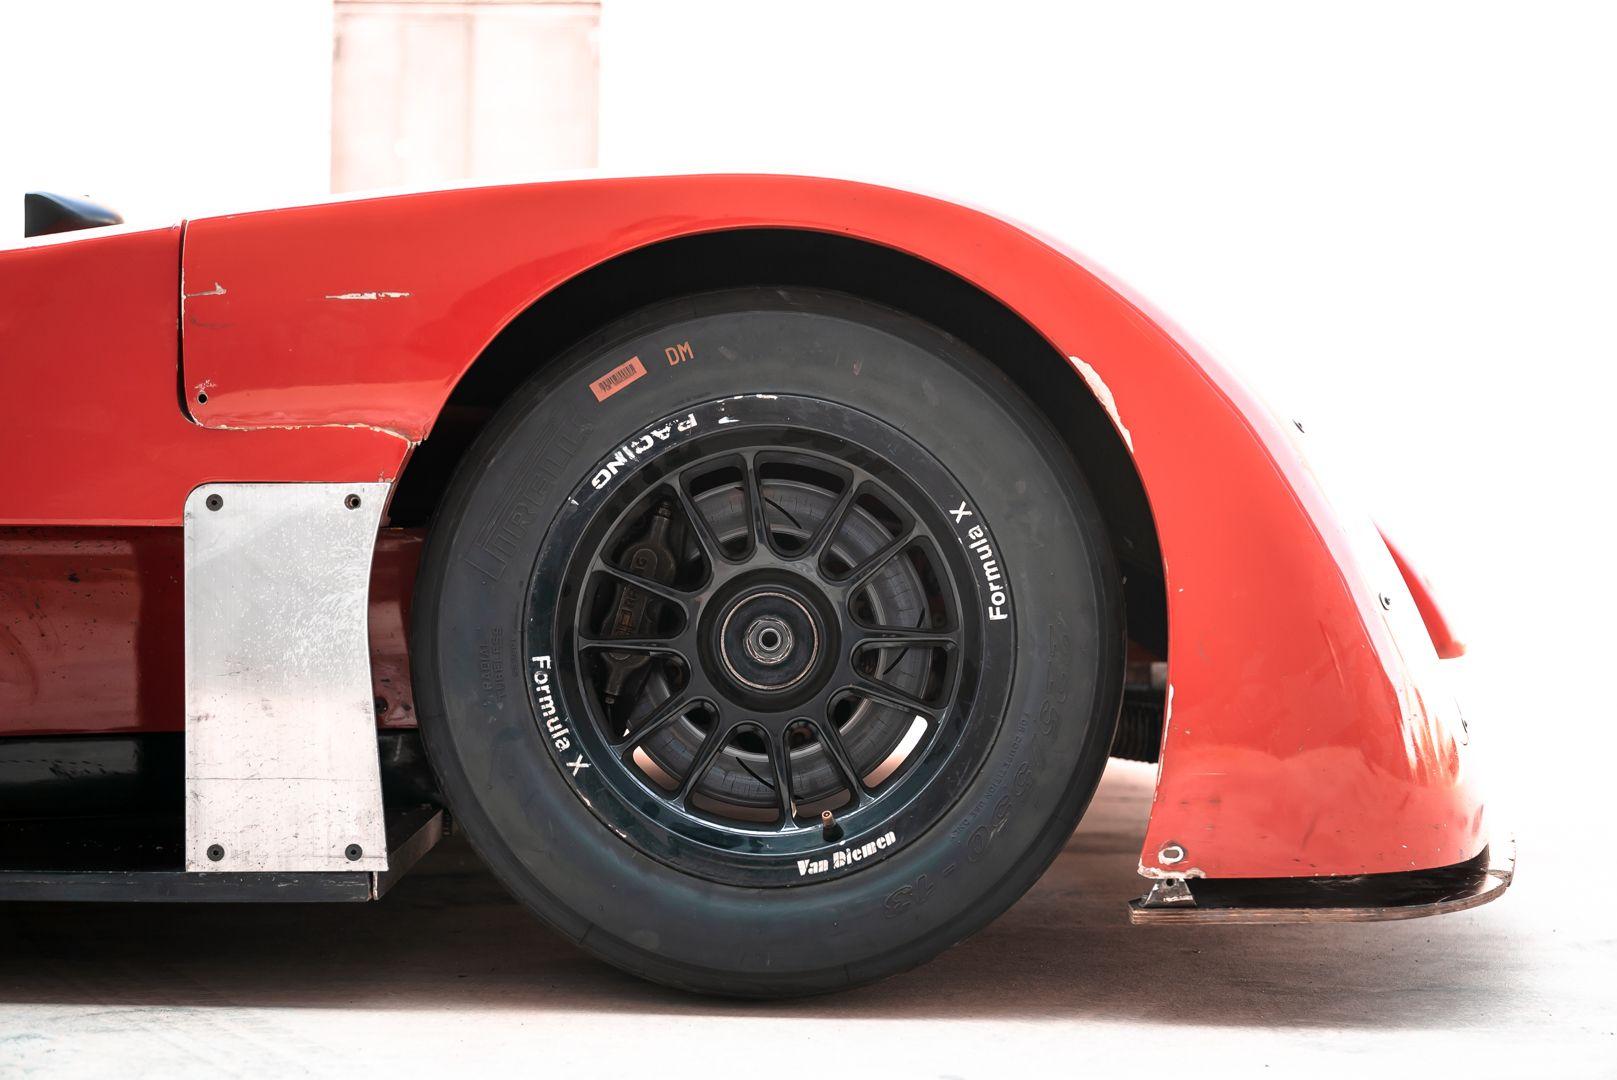 2004 Van Diemen Formula X RF04 CFX 68839